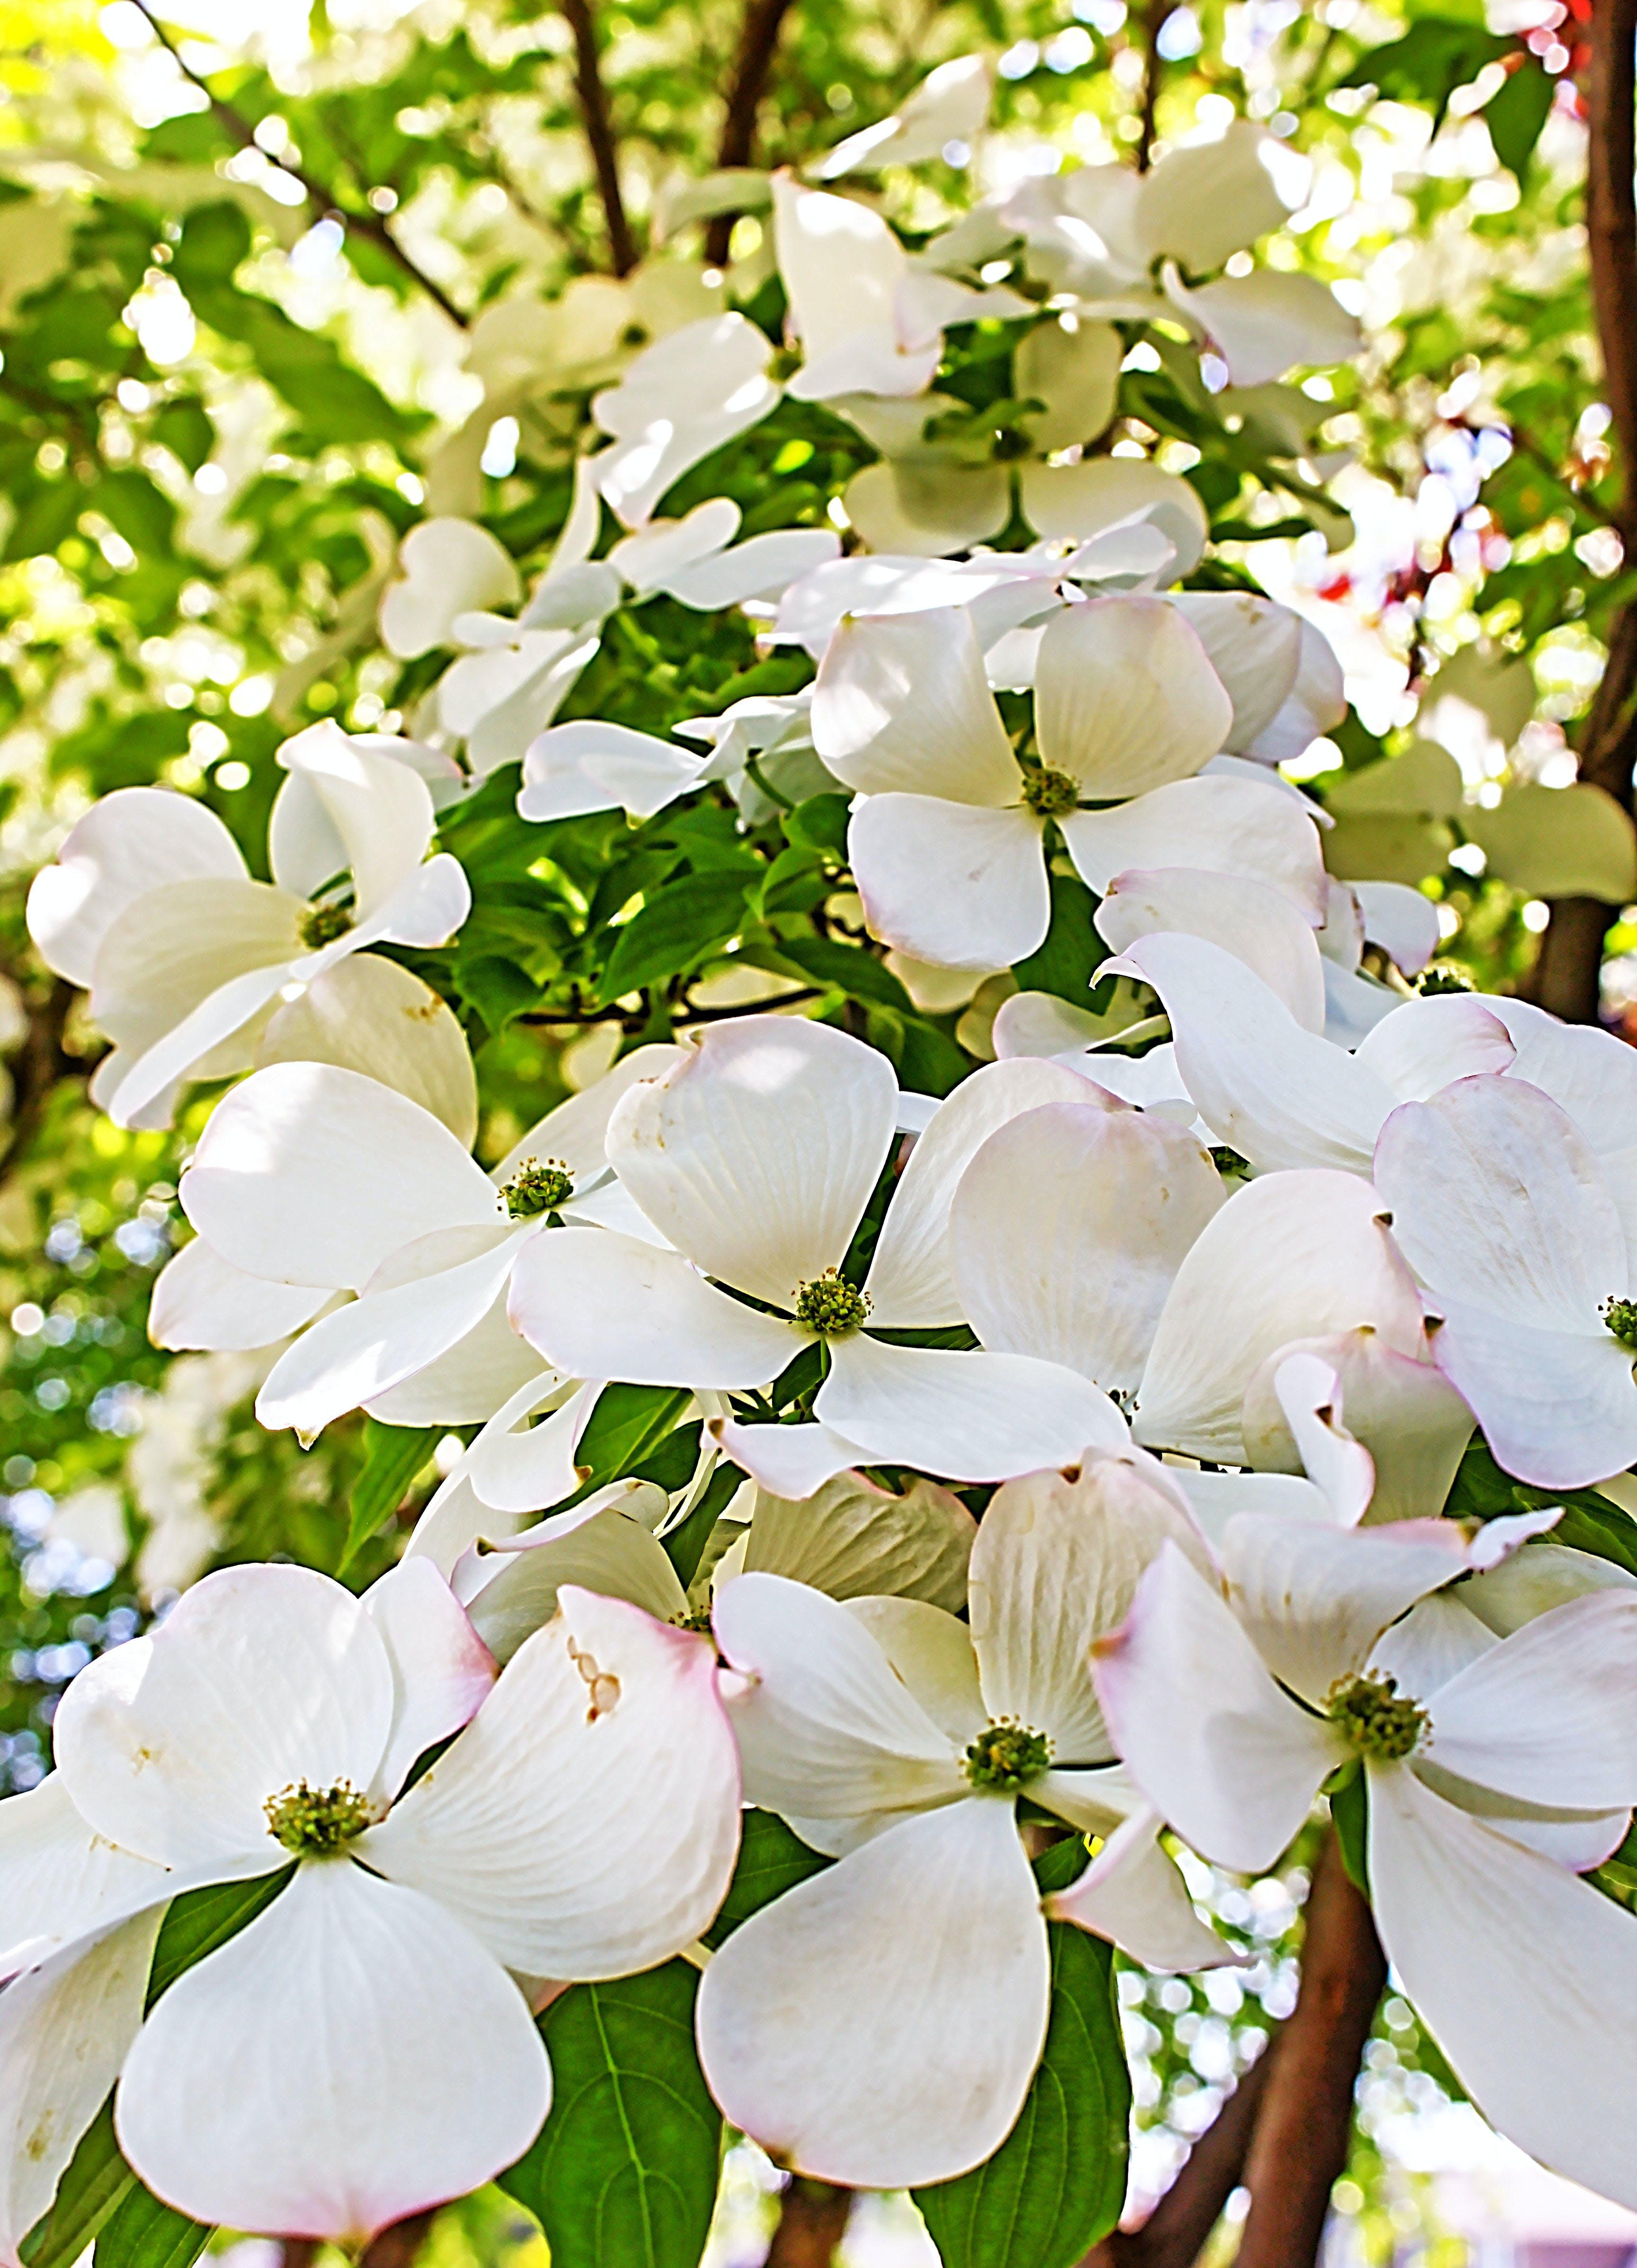 Free stock photo of flowers, spring, dogwood